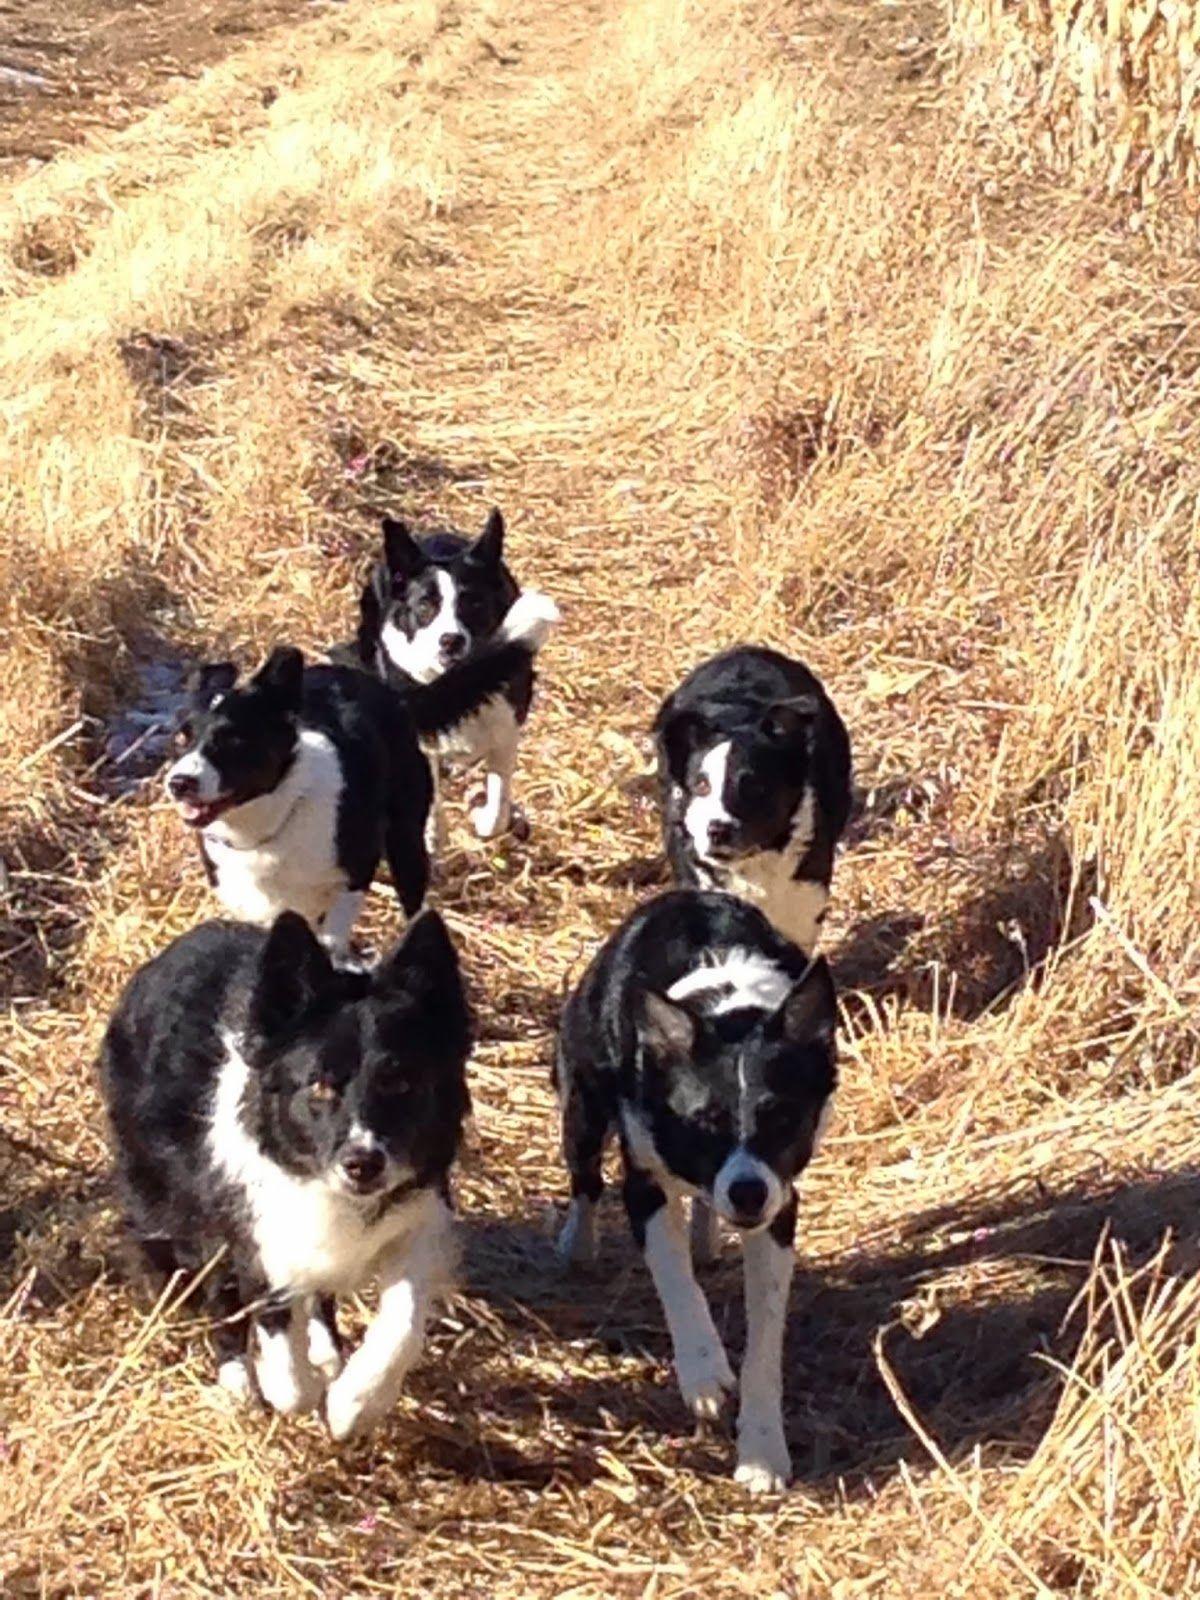 Threshholds And Gig Crazy Dog Lady Crazy Dog Border Collie